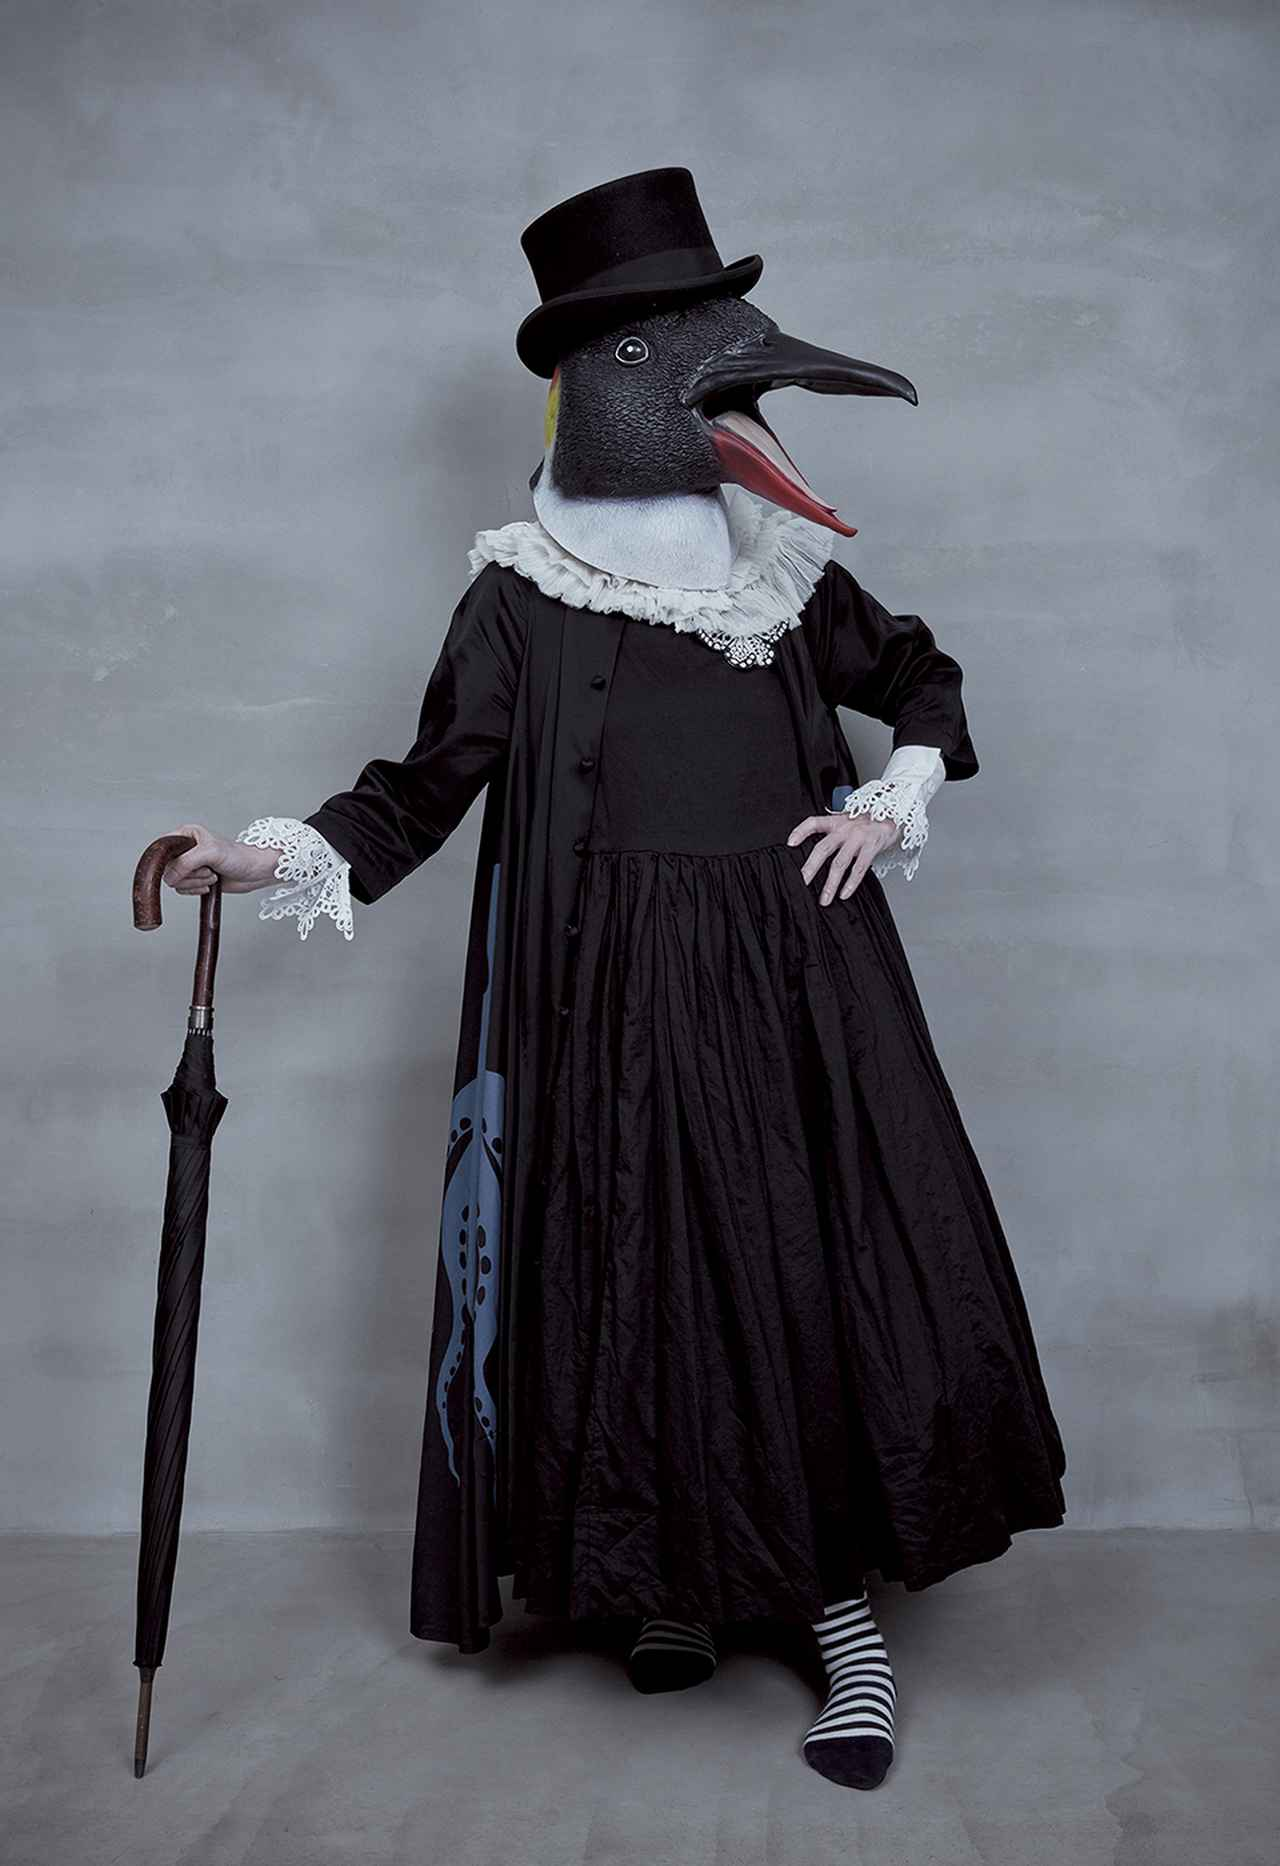 Images : 1番目の画像 - 「画家ヒグチユウコの 世界をつくるもの」のアルバム - T JAPAN:The New York Times Style Magazine 公式サイト